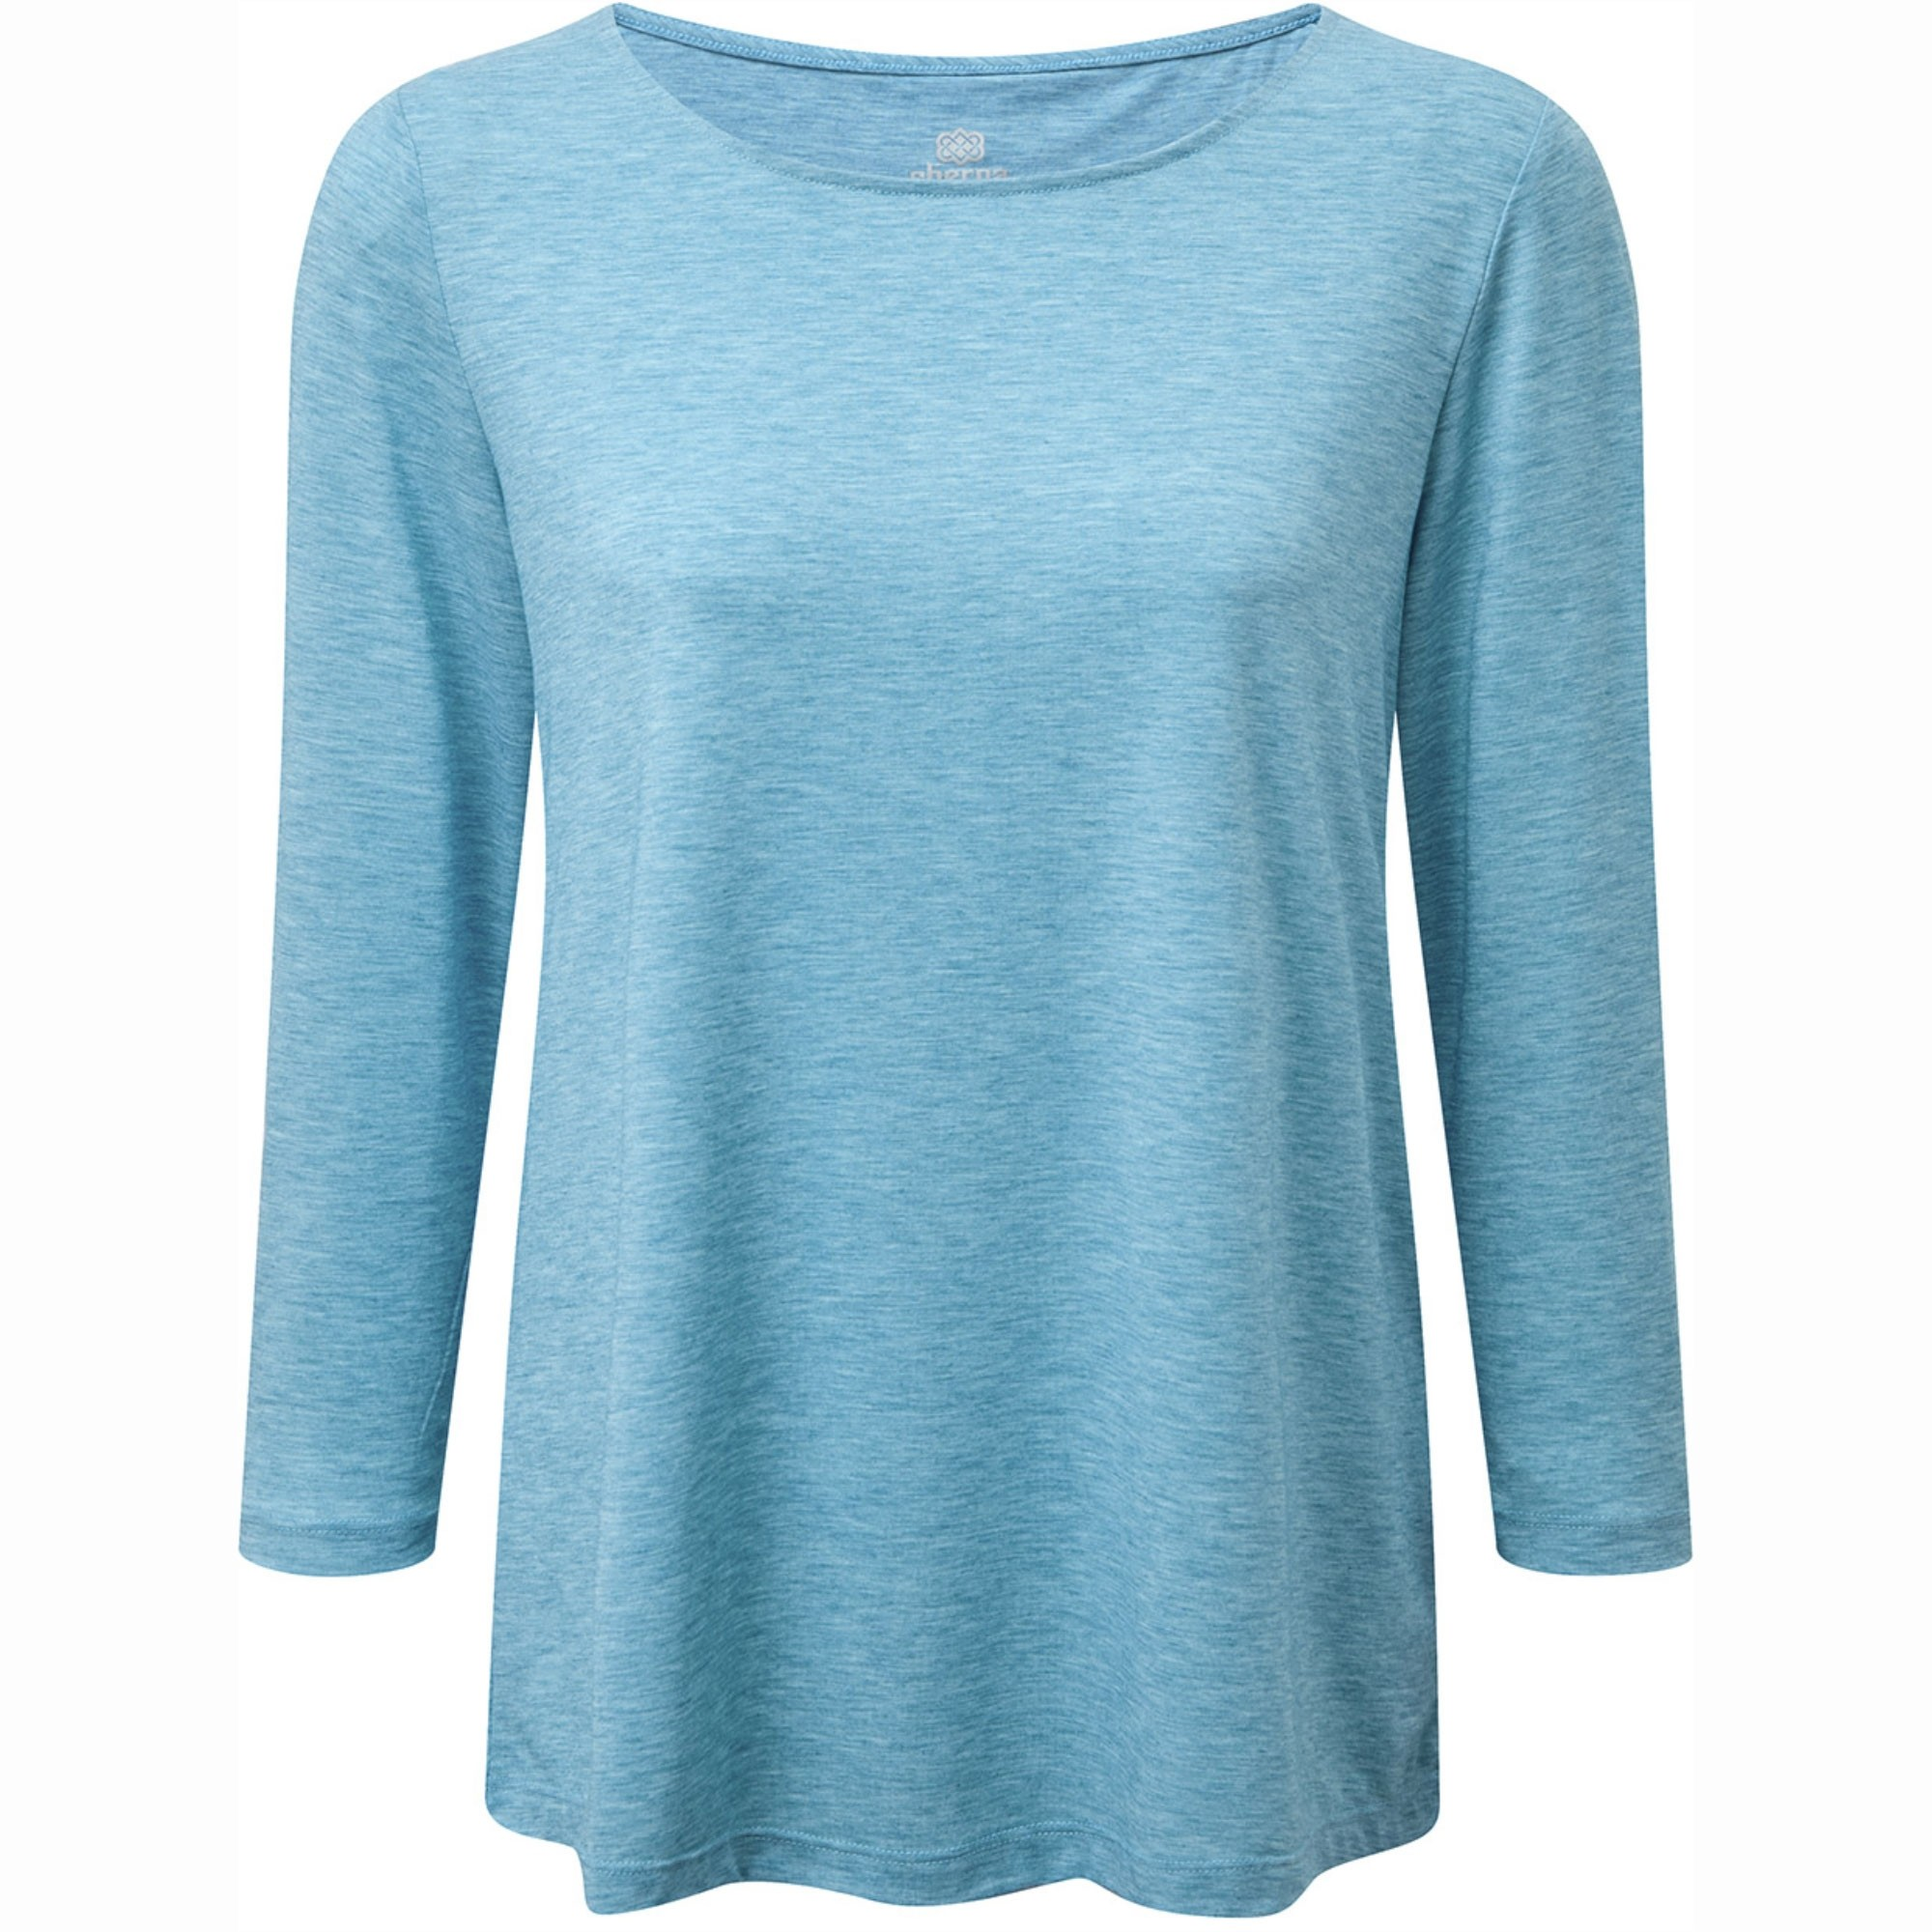 SHERPA - Asha Women's ¾ Knit Top - Blue Tara